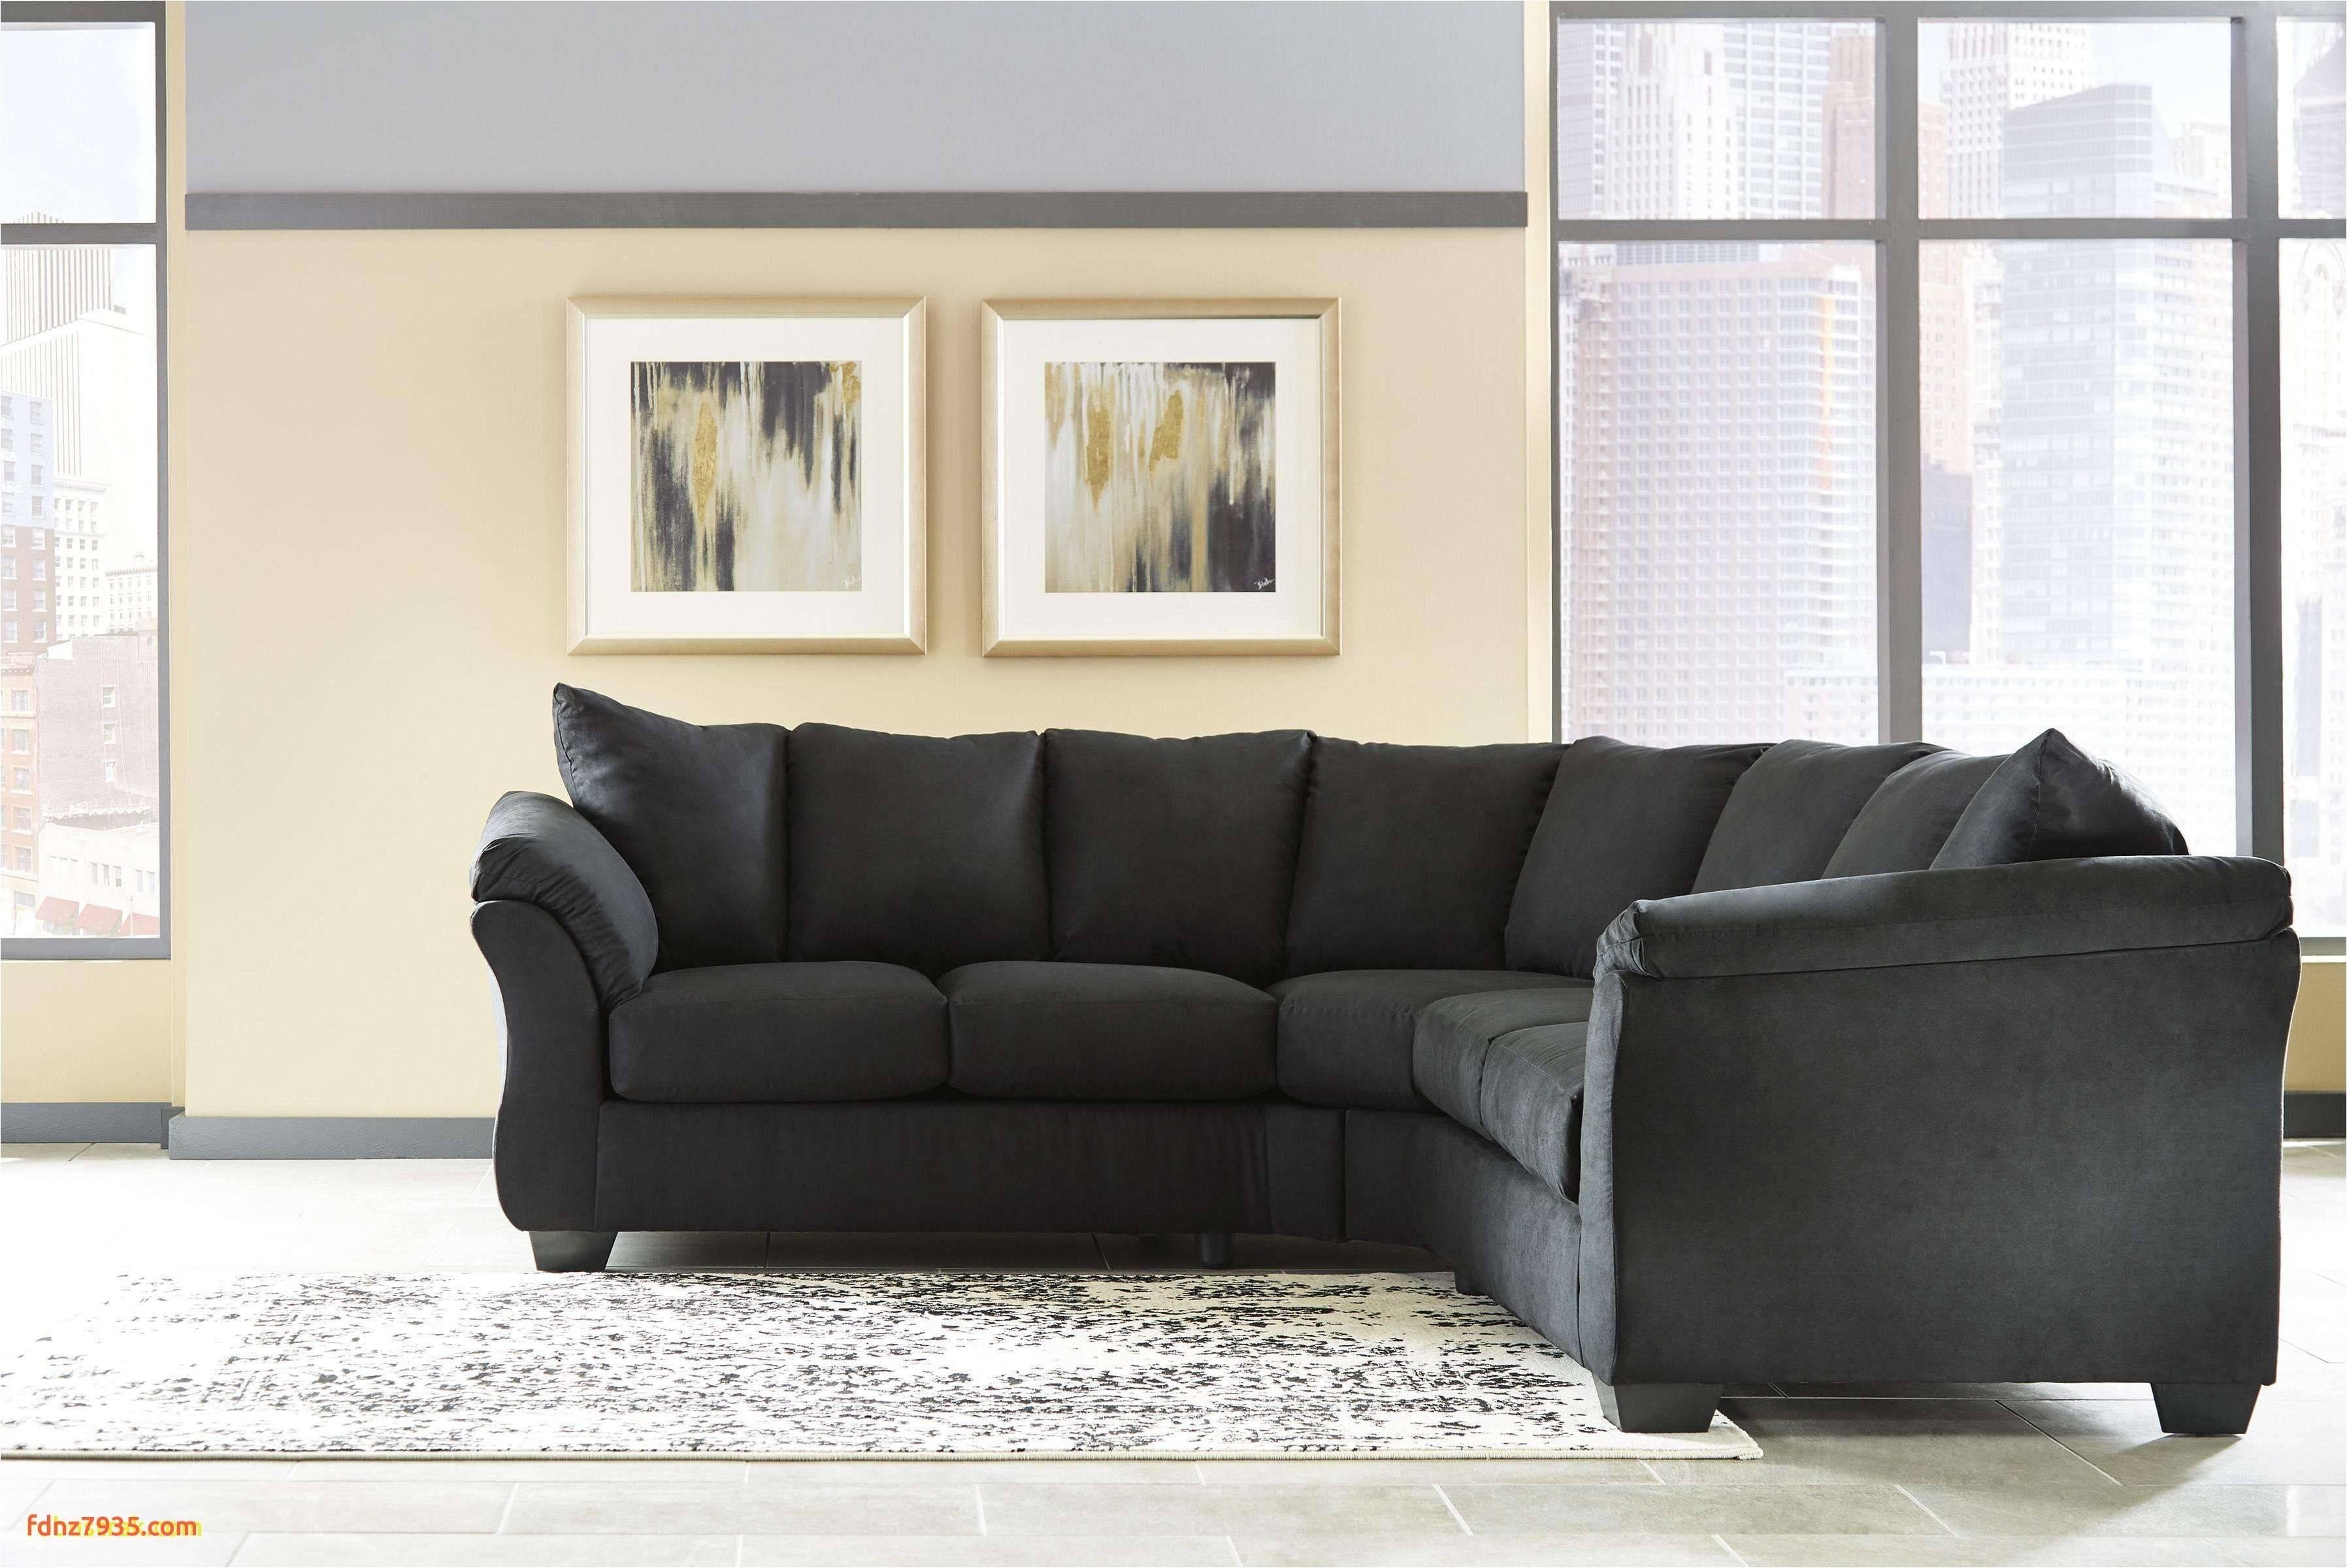 sofa ke design furniture luxury luxury l shaped sofa home interior design list of interior of sofa ke design furniture